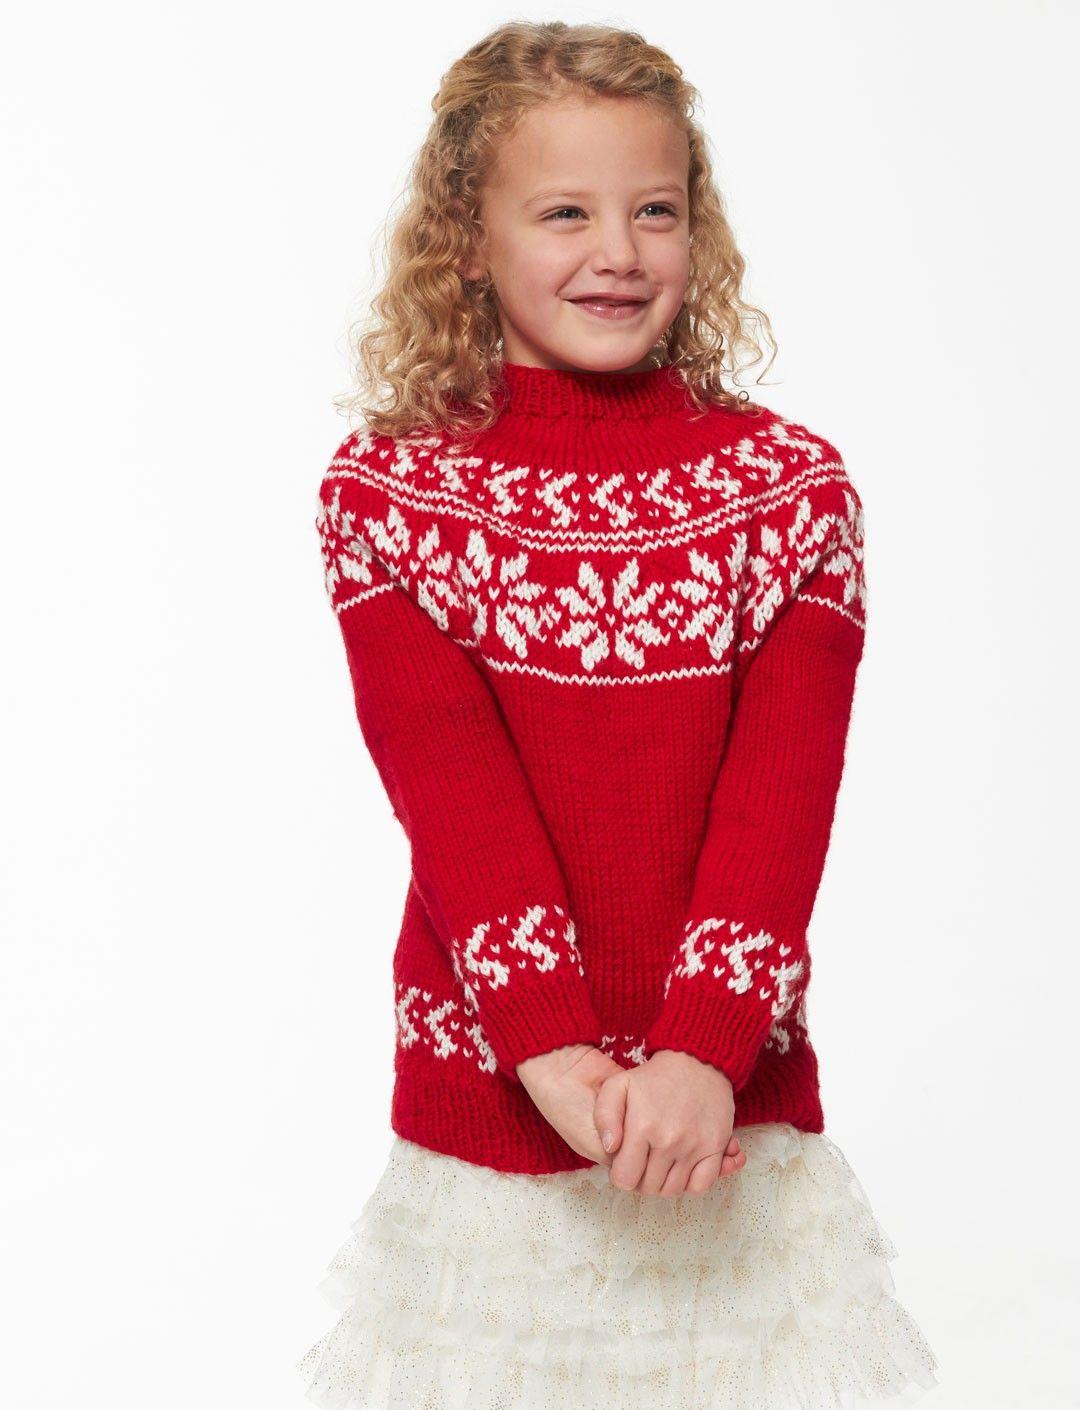 Bernat yuletide yoke free knitting pattern for snowflake childs bernat yuletide yoke free knitting pattern for snowflake childs sweater bankloansurffo Images